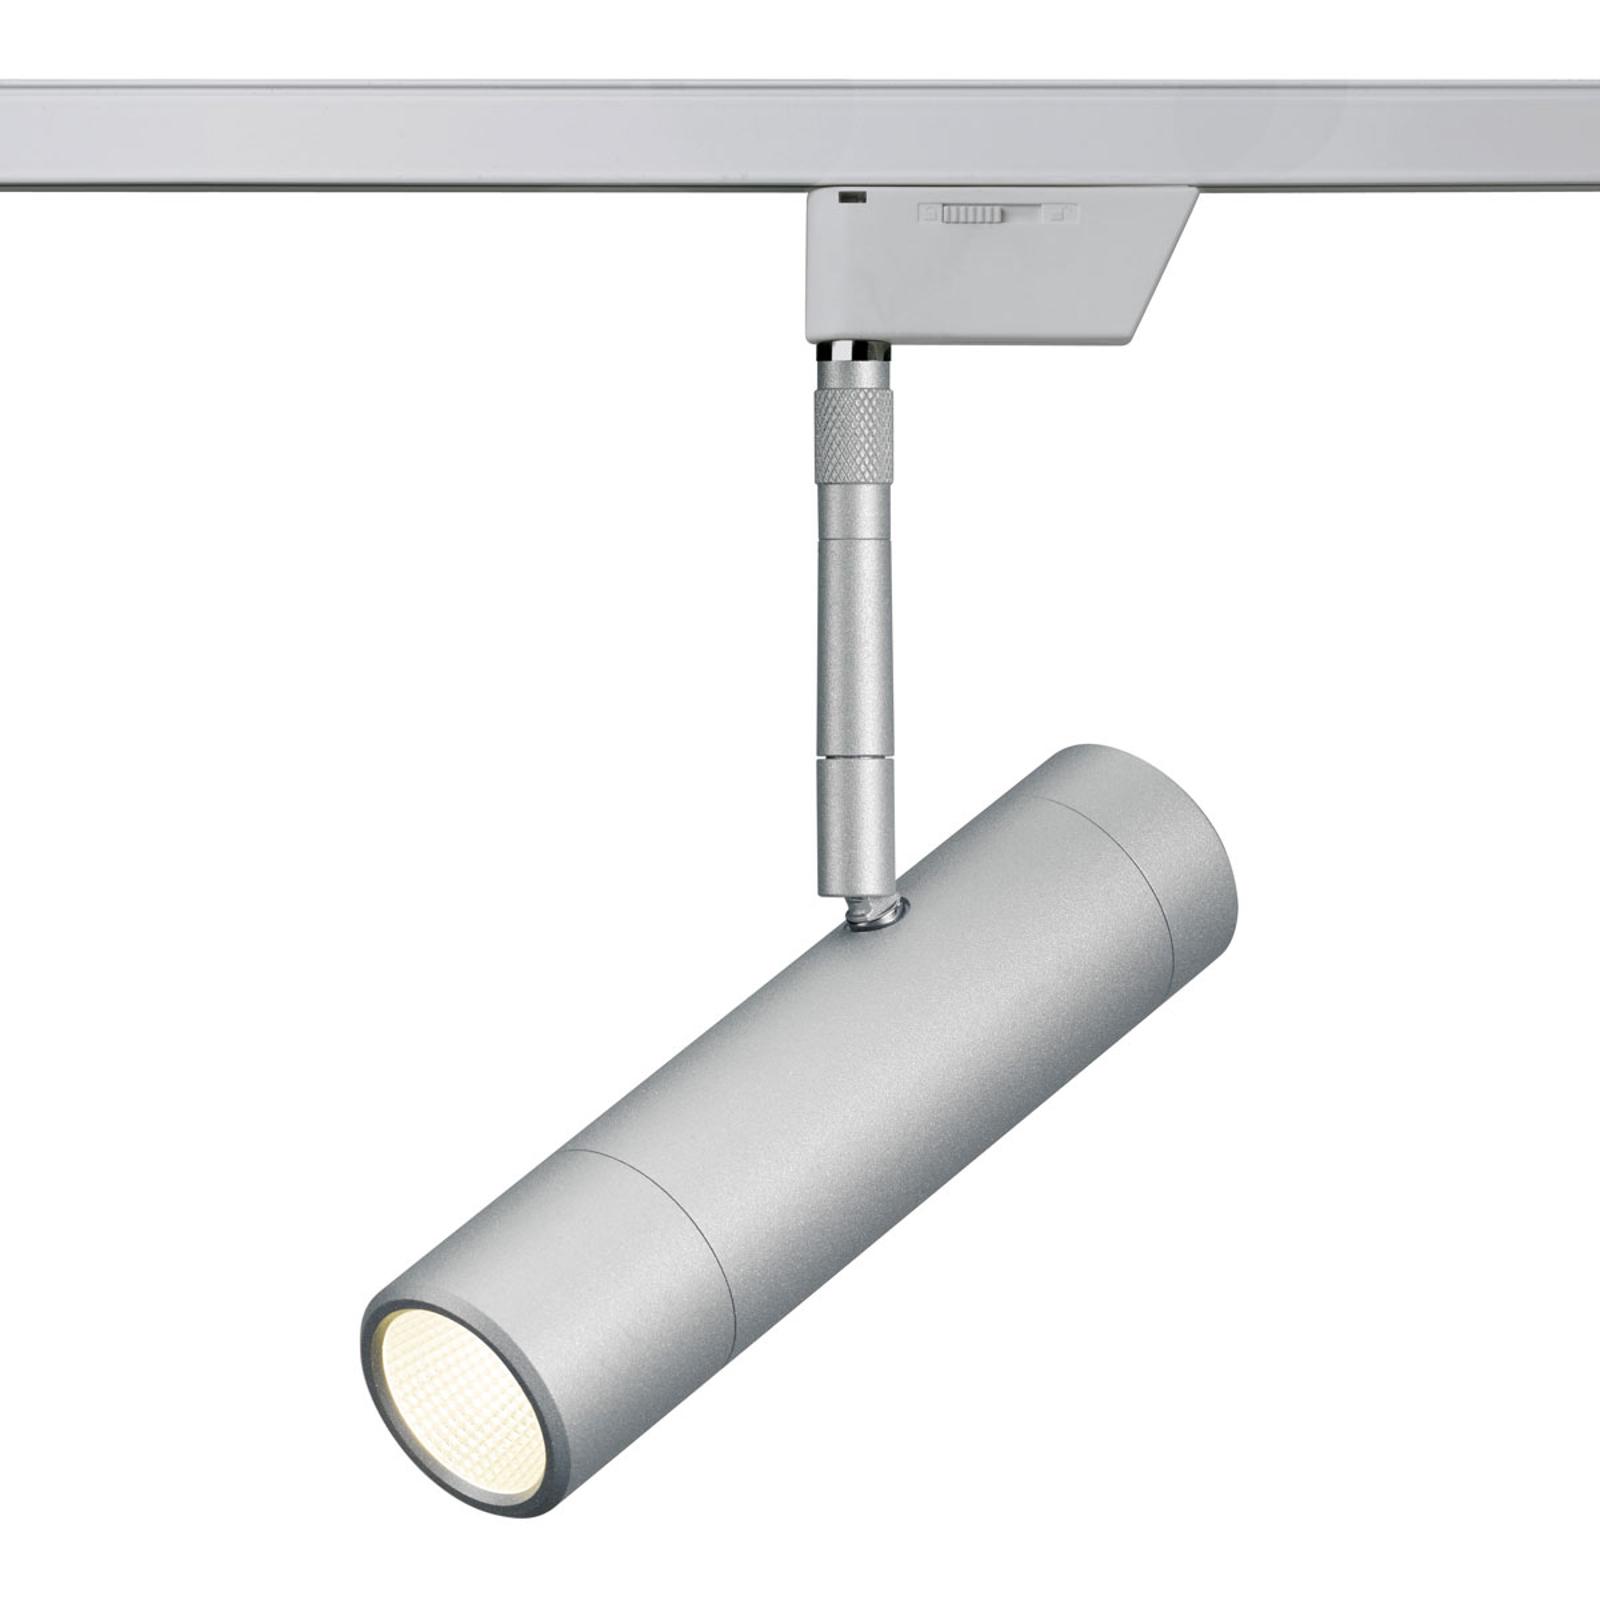 Oligo Sentry LED-Schienenspot chrom matt 2.700 K